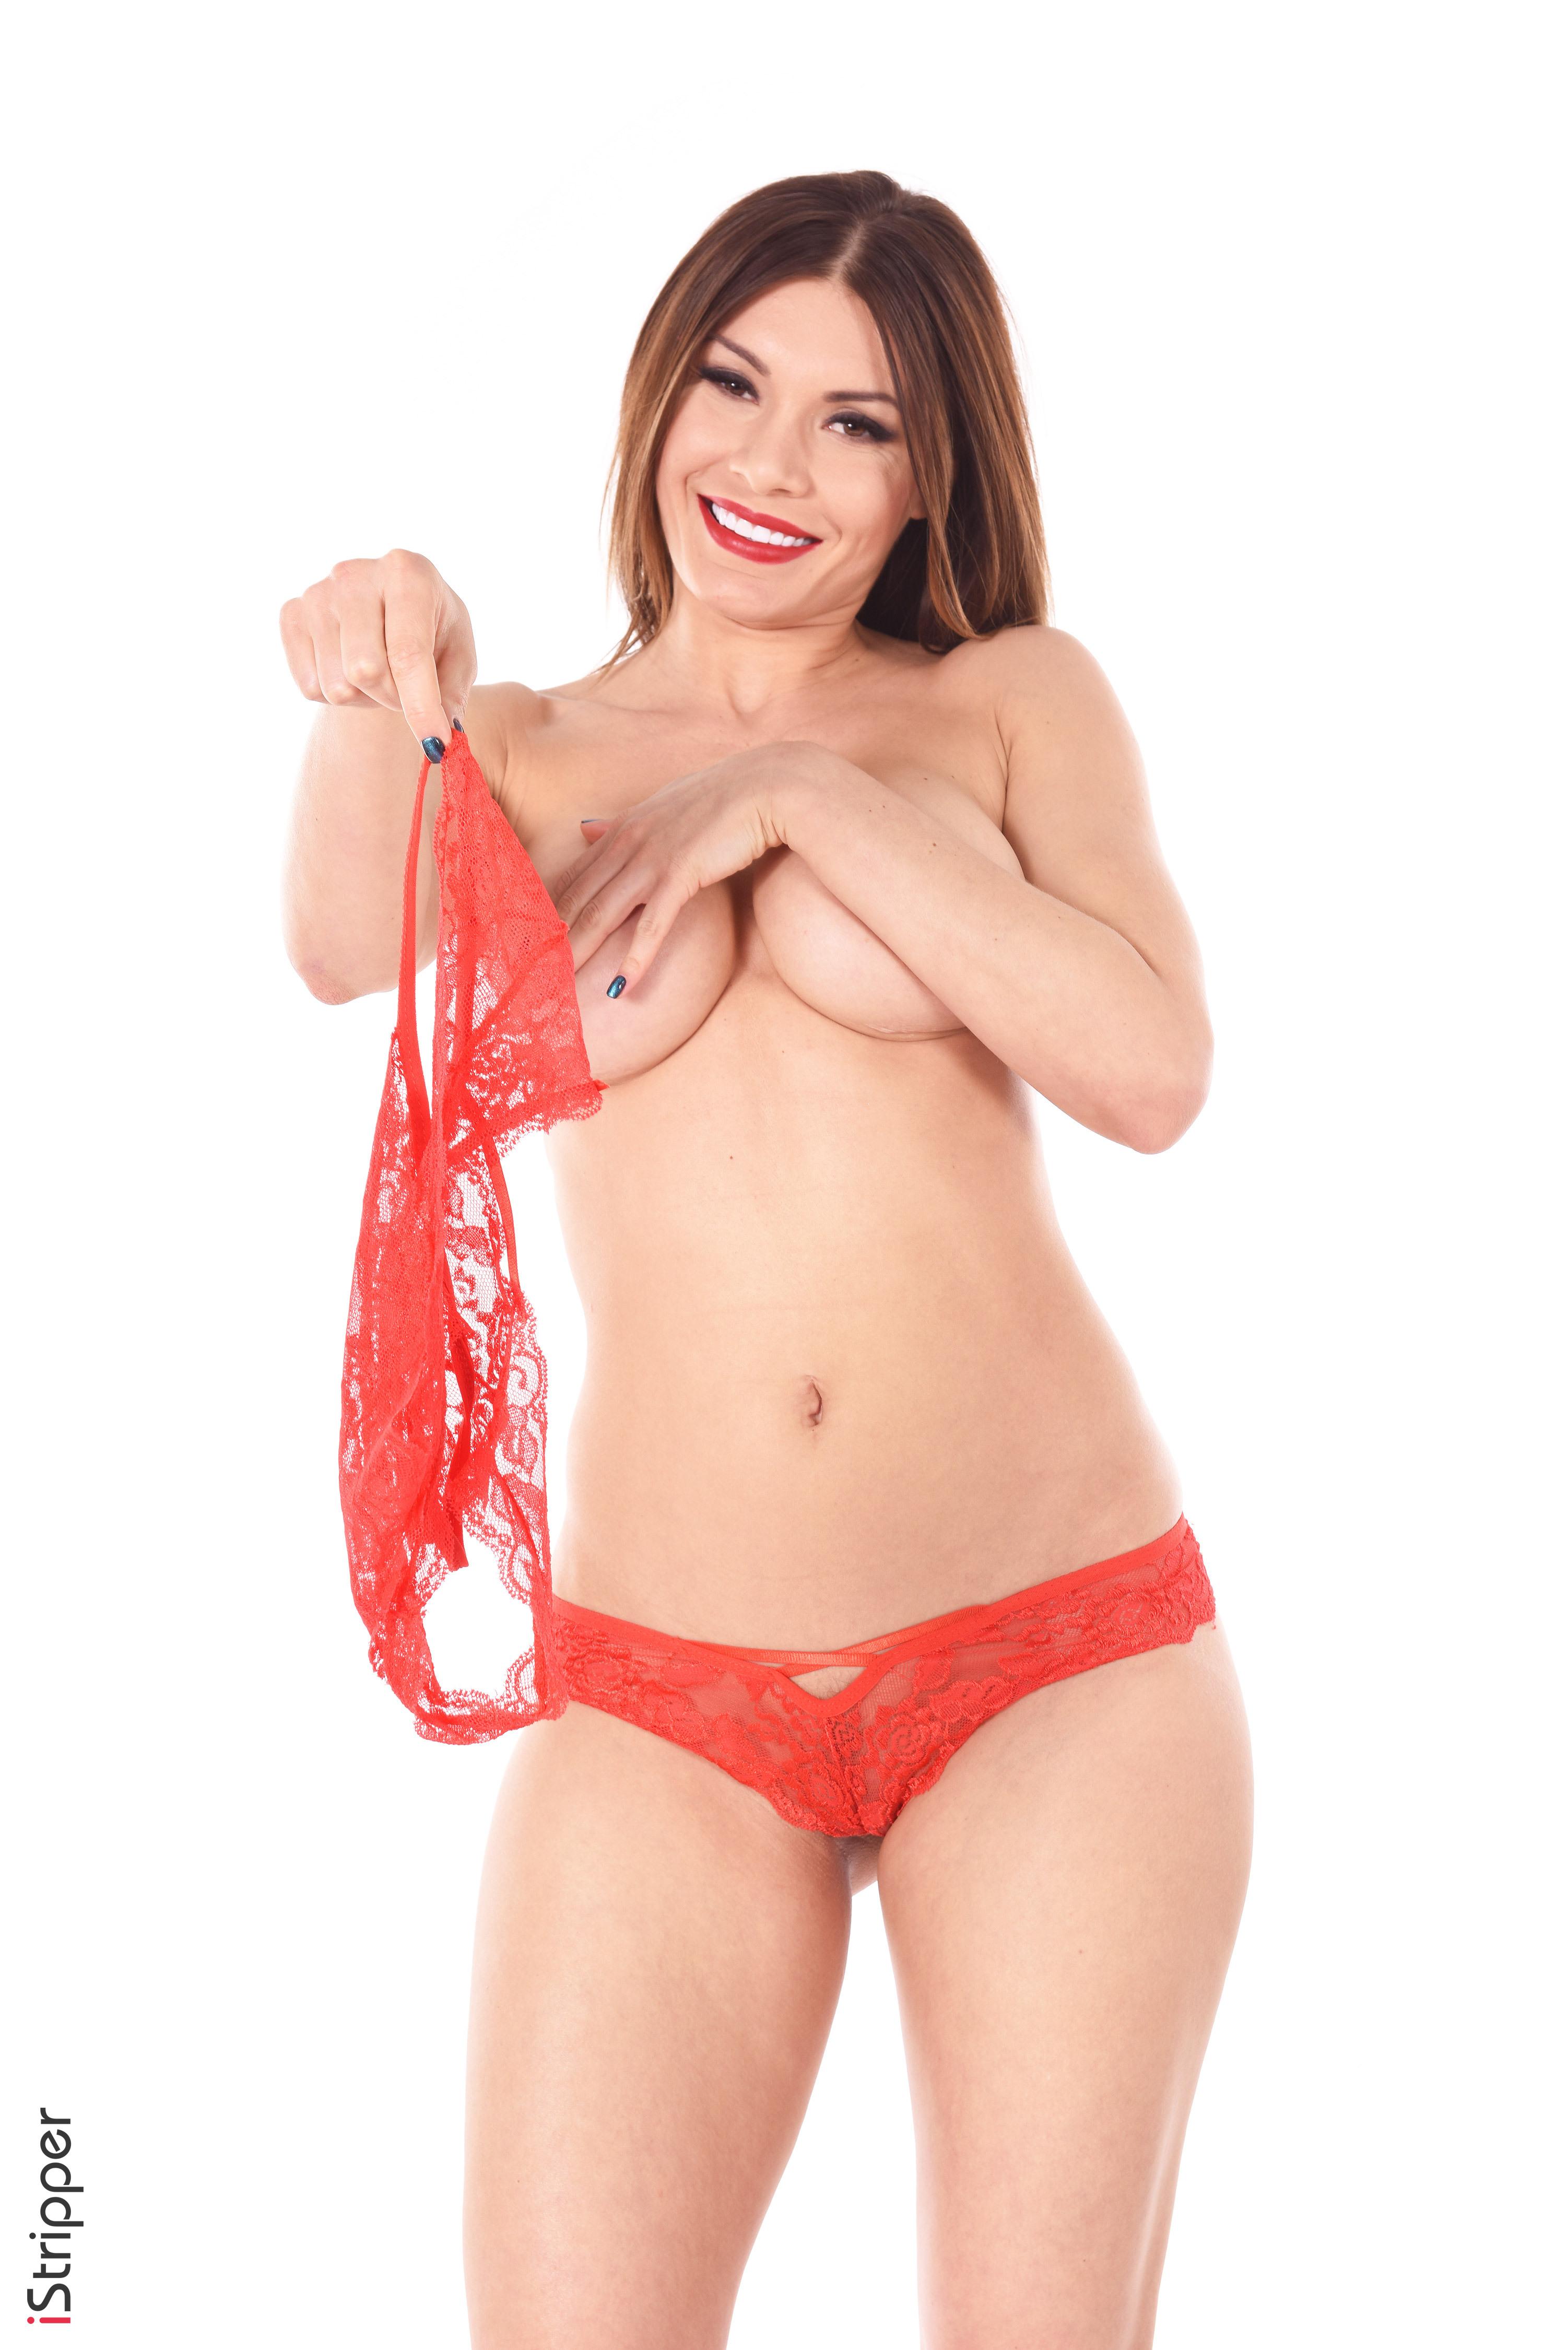 erotic nude wallpaper